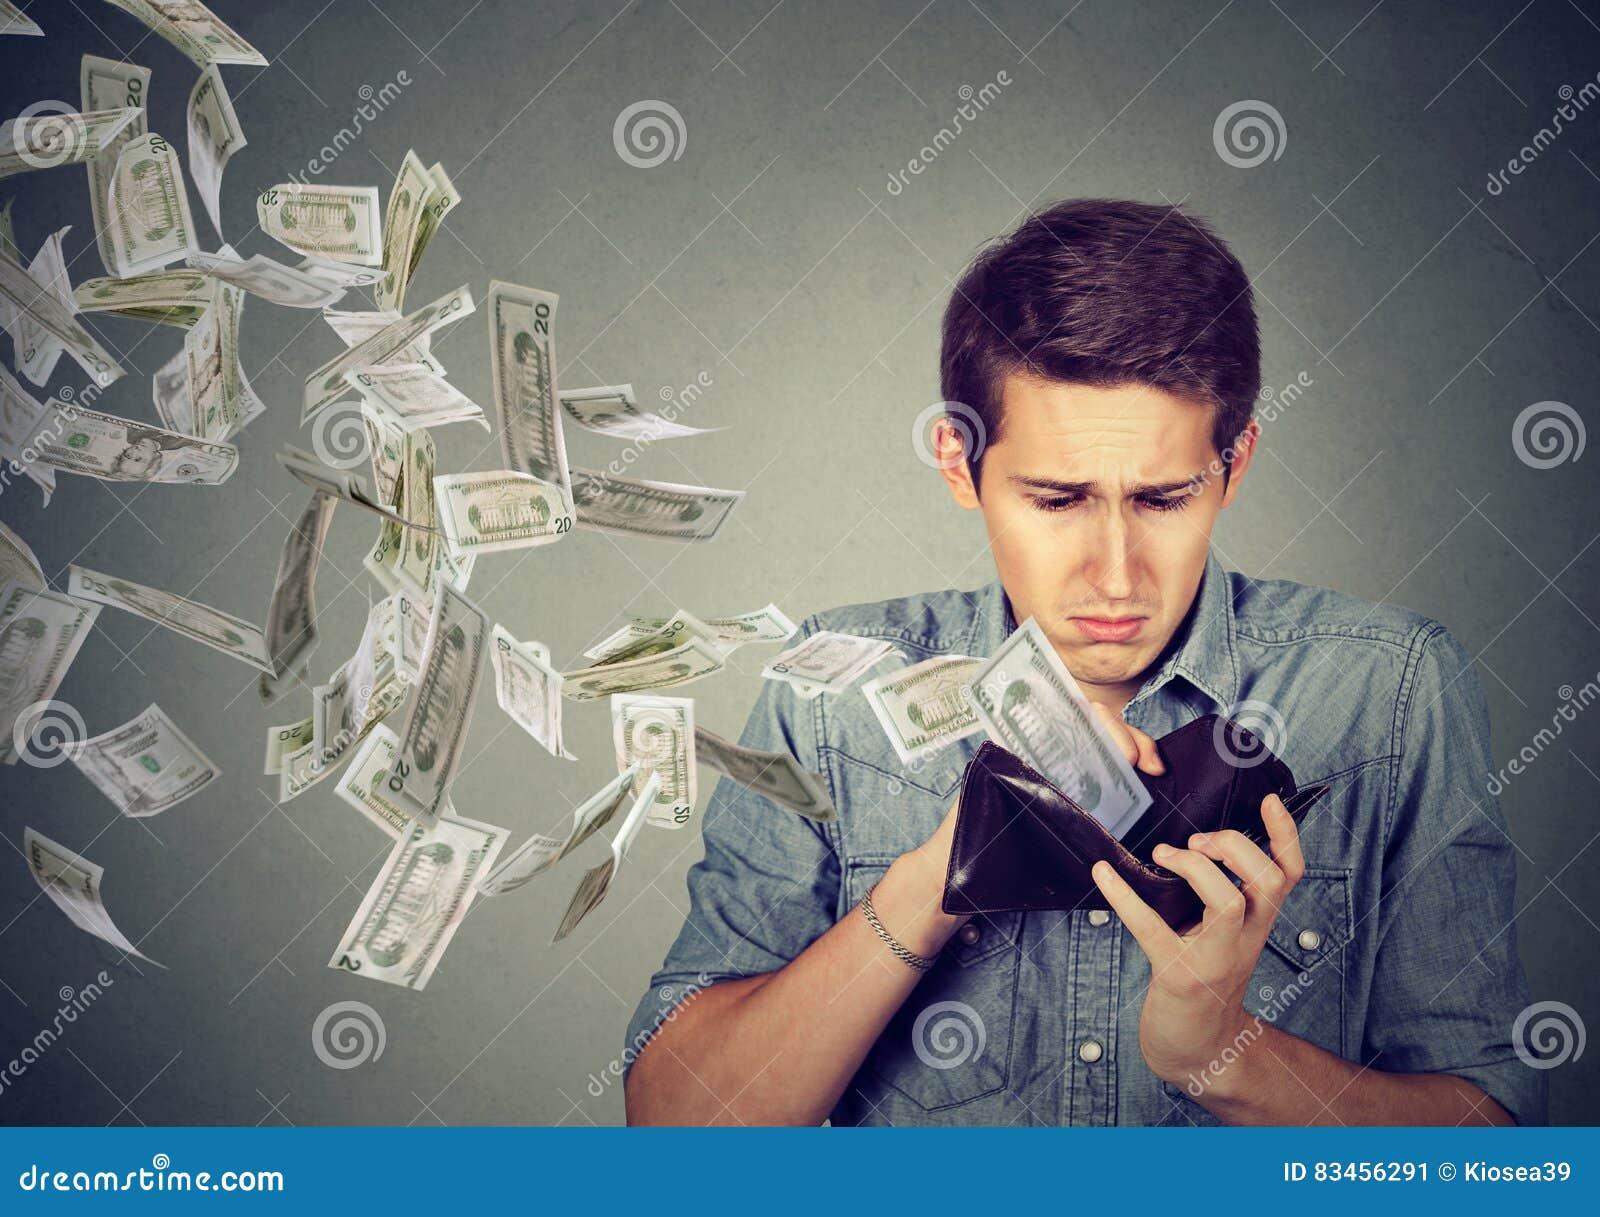 Sad man looking at wallet with money dollars flying away